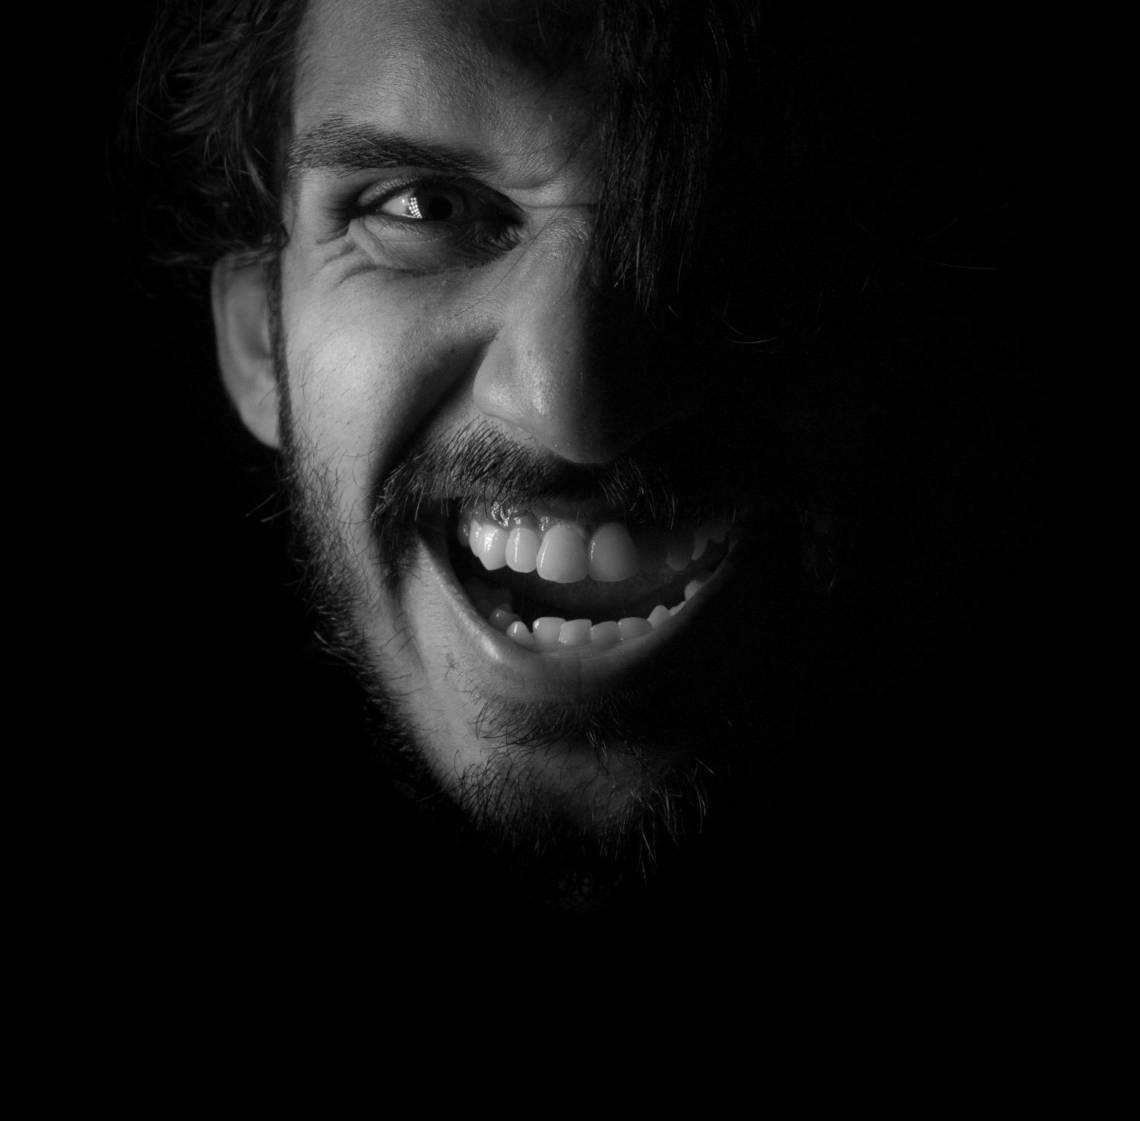 a man baring his teeth